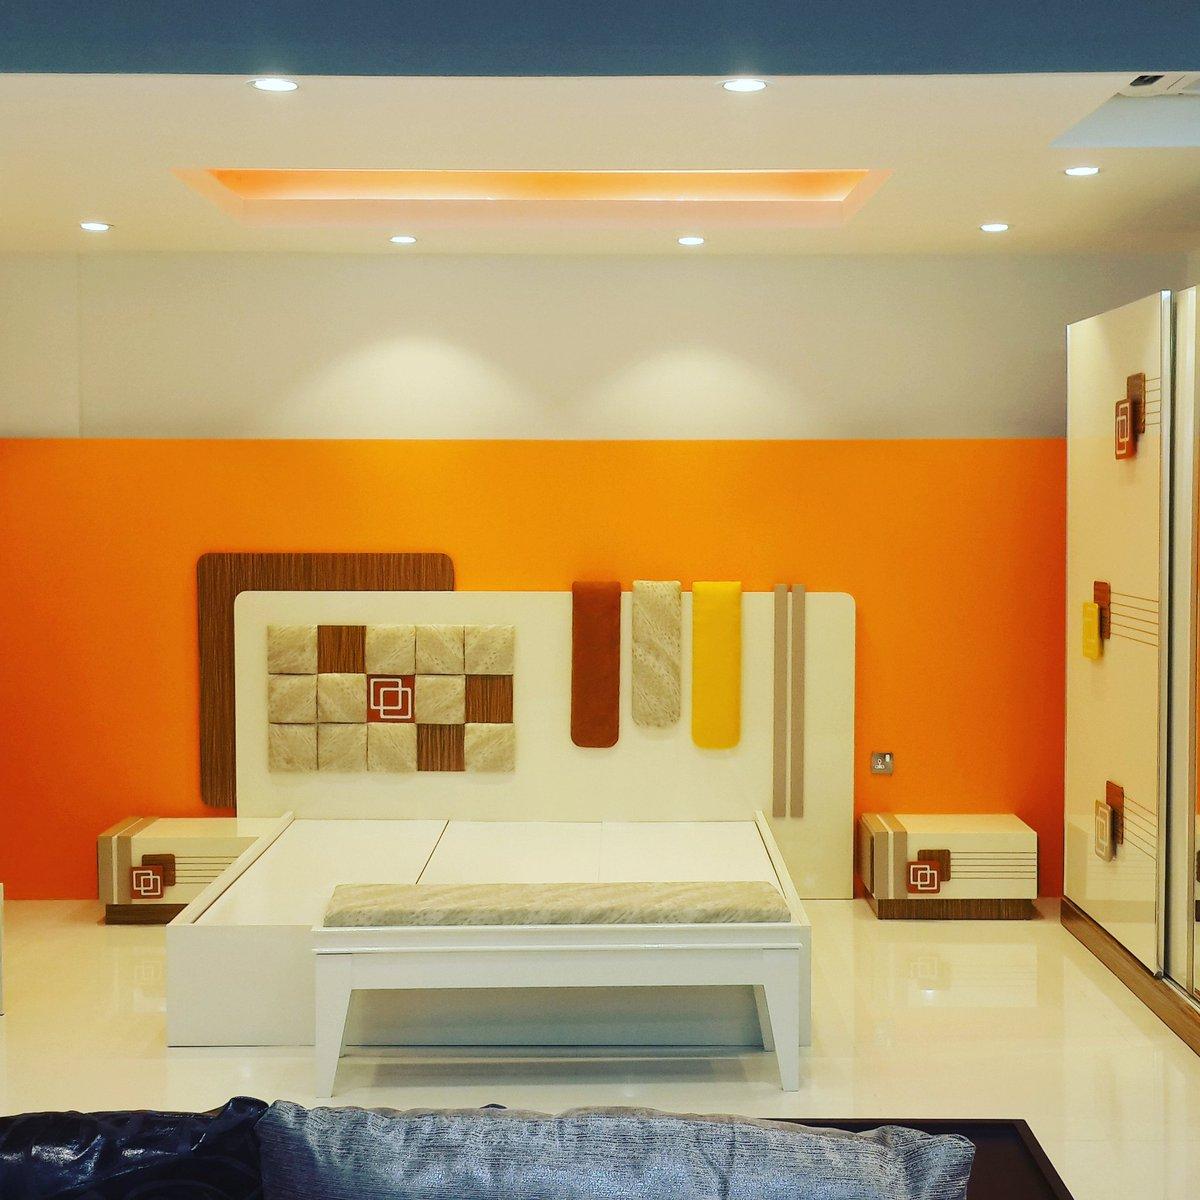 Bedroom Design .. Oman Interiors@design Firm : Home Mart International ..  Designer : Mustafa Kantawalapic.twitter.com/YvjQR57cWB